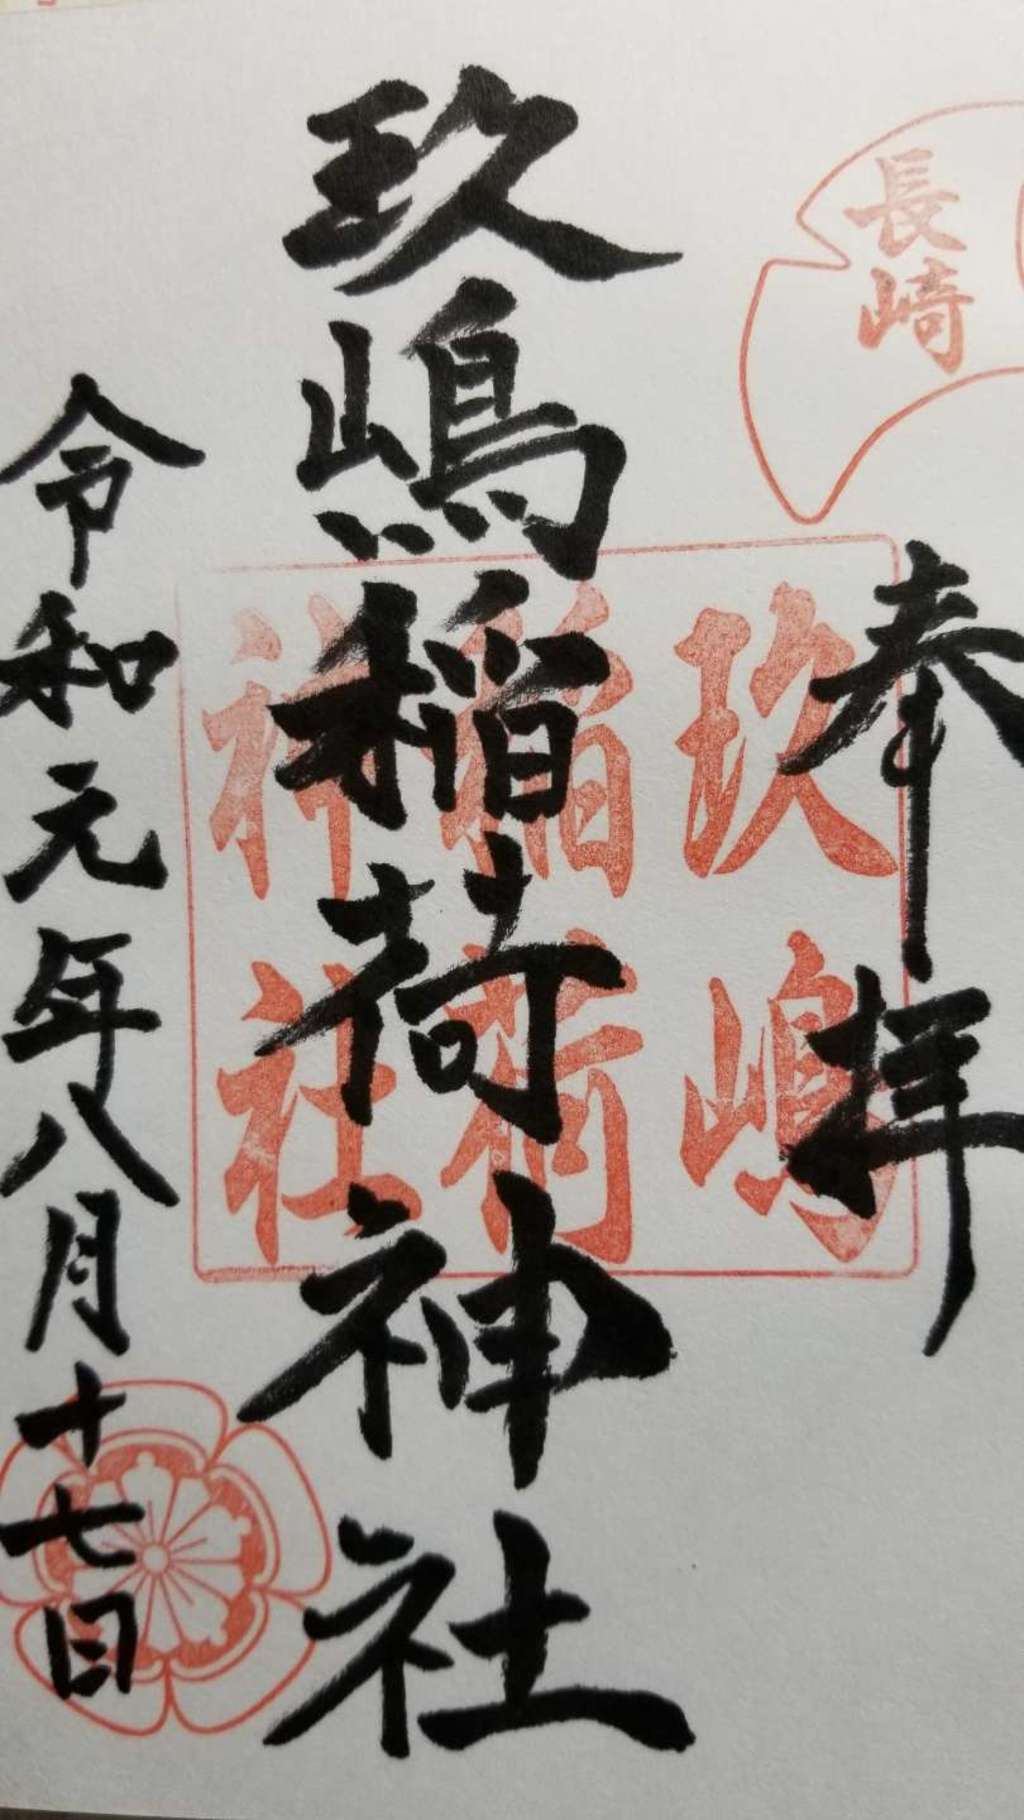 玖島稲荷神社の御朱印